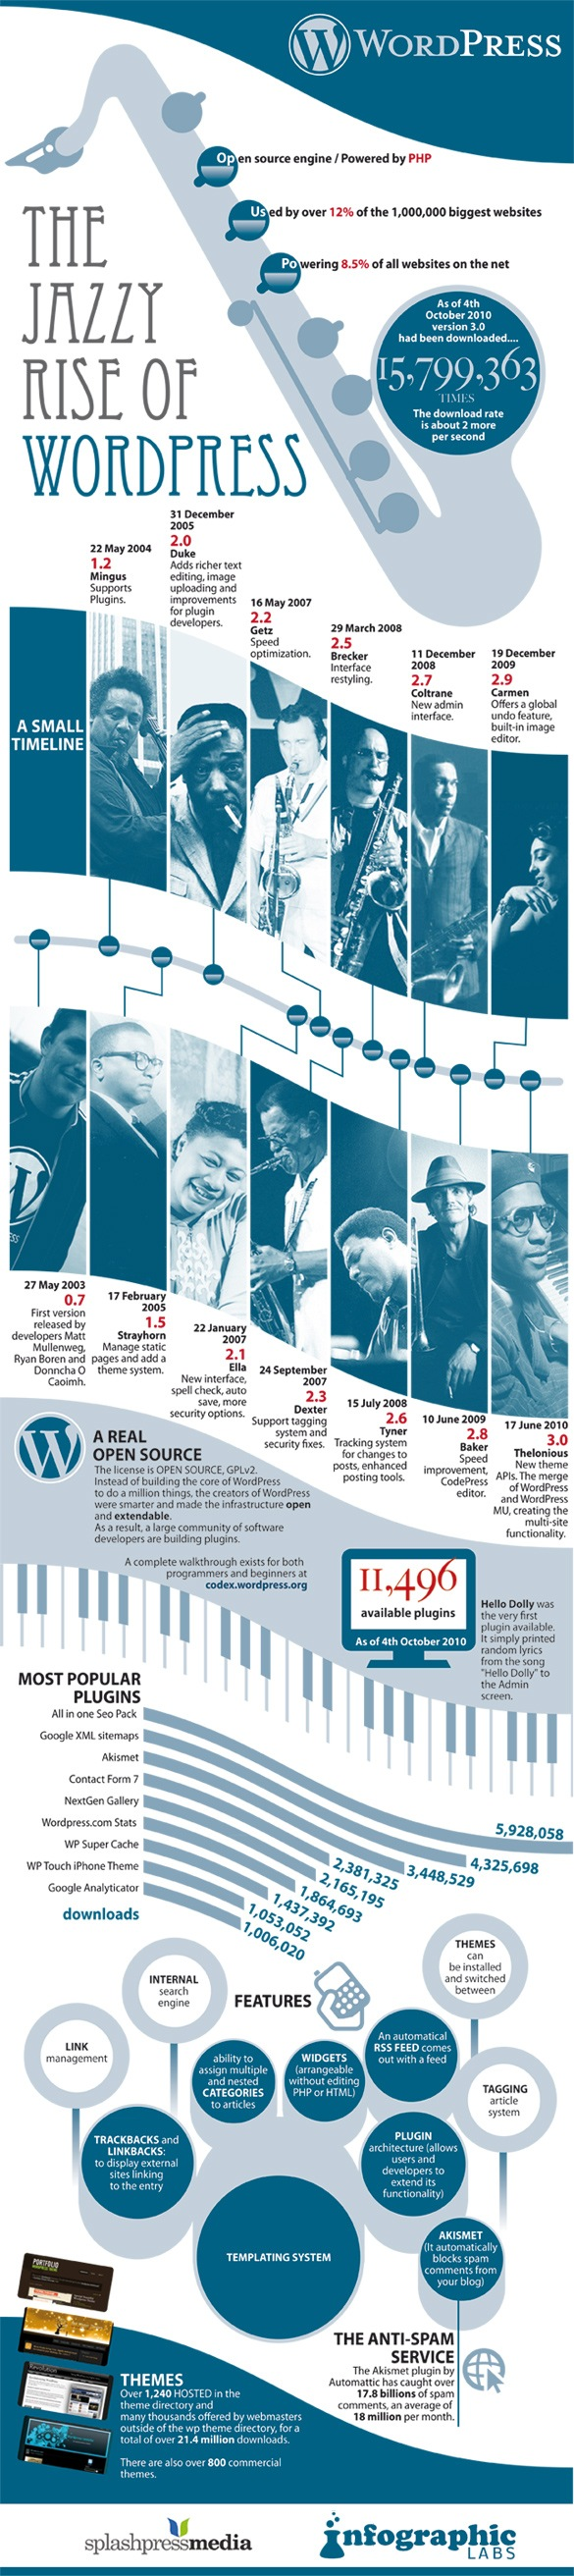 L'histoire de WordPress